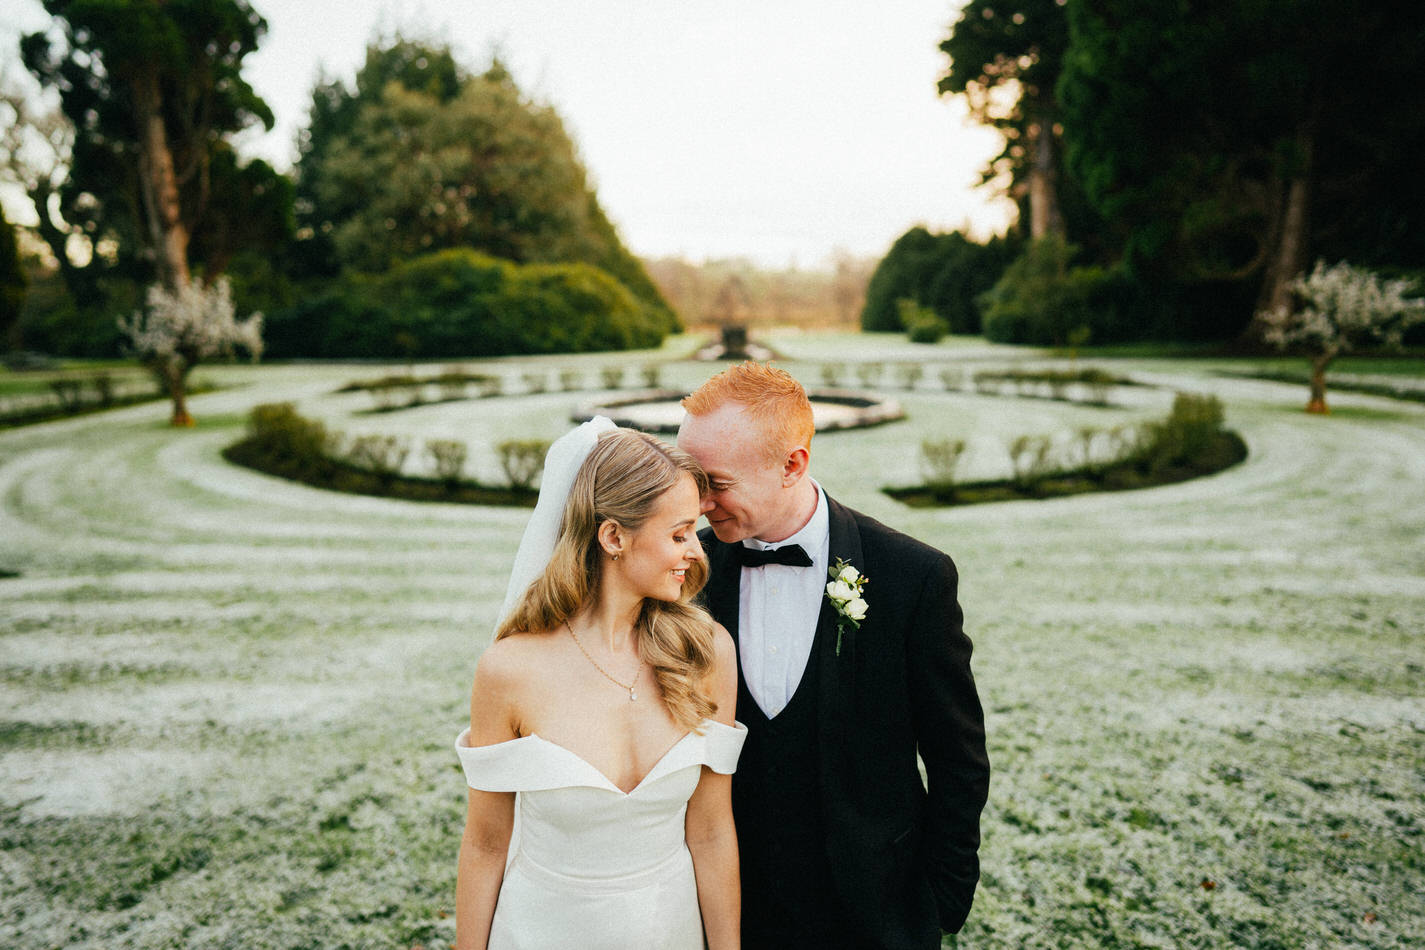 Castle-wedding-ireland-photos- 0204 146